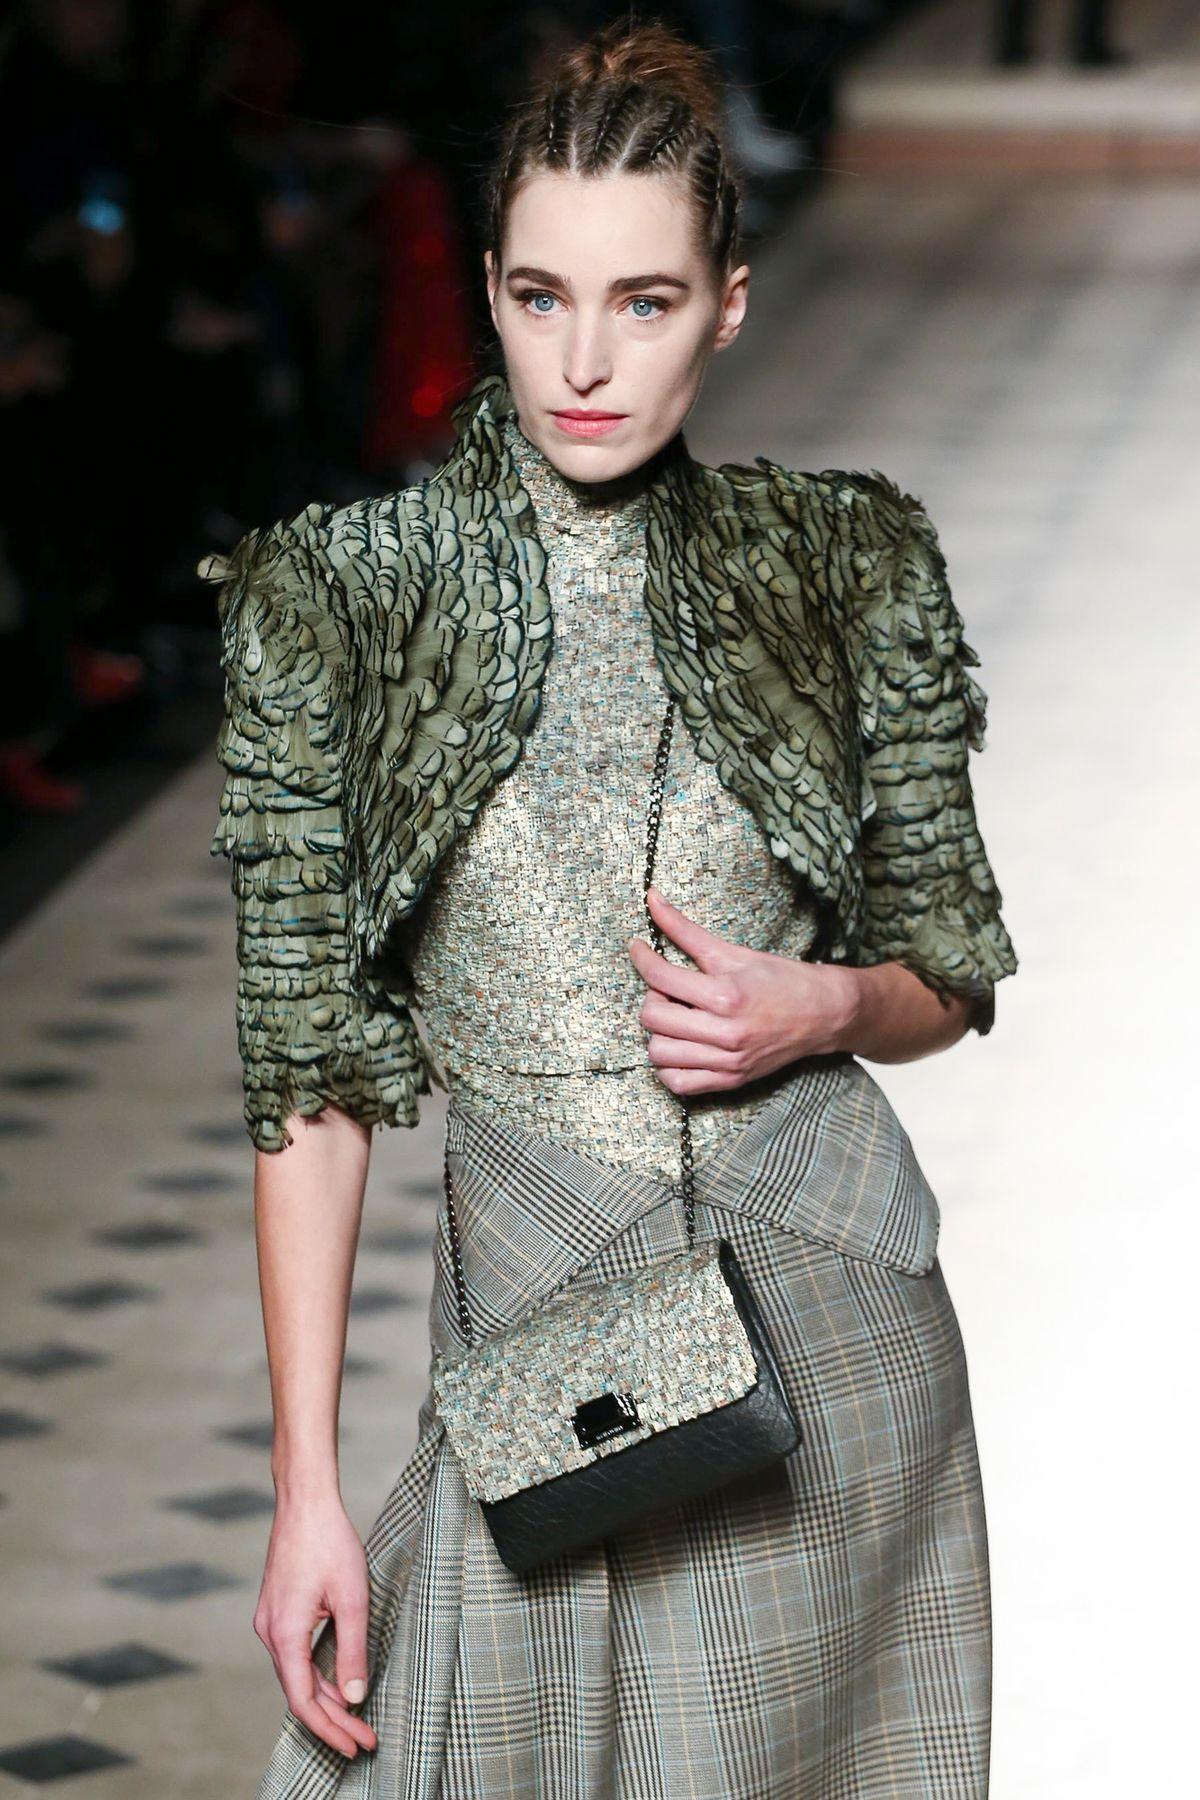 Julien Fournié Spring 2020 Haute Couture #julien fournie #spring 2020 couture #haute couture#runway details#renata scheffer